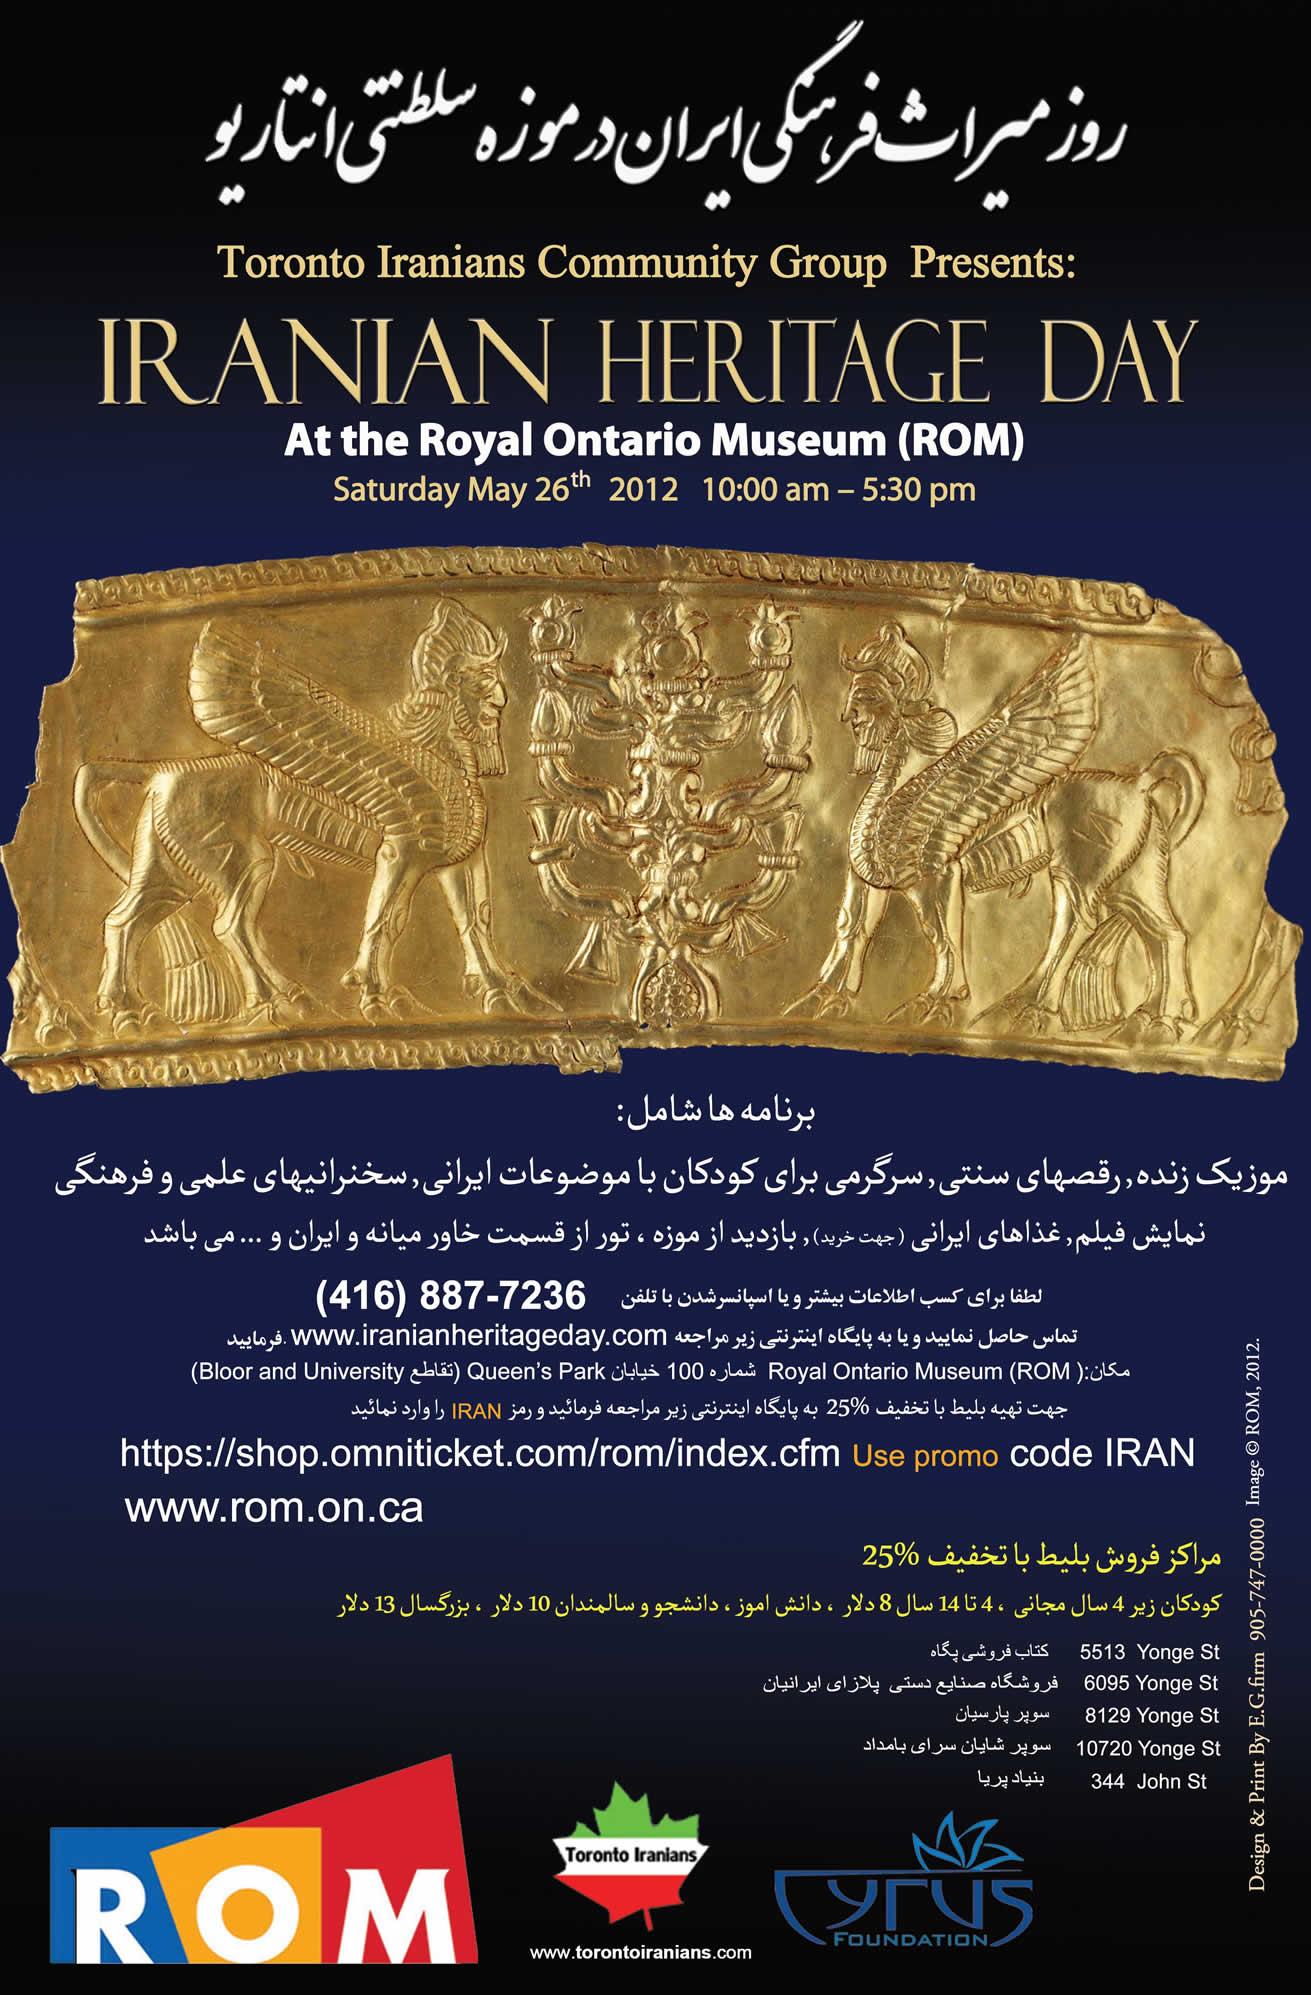 Main_Poster_Iranian Heritage Day_Royal Ontario Museum_May_26_2012_s